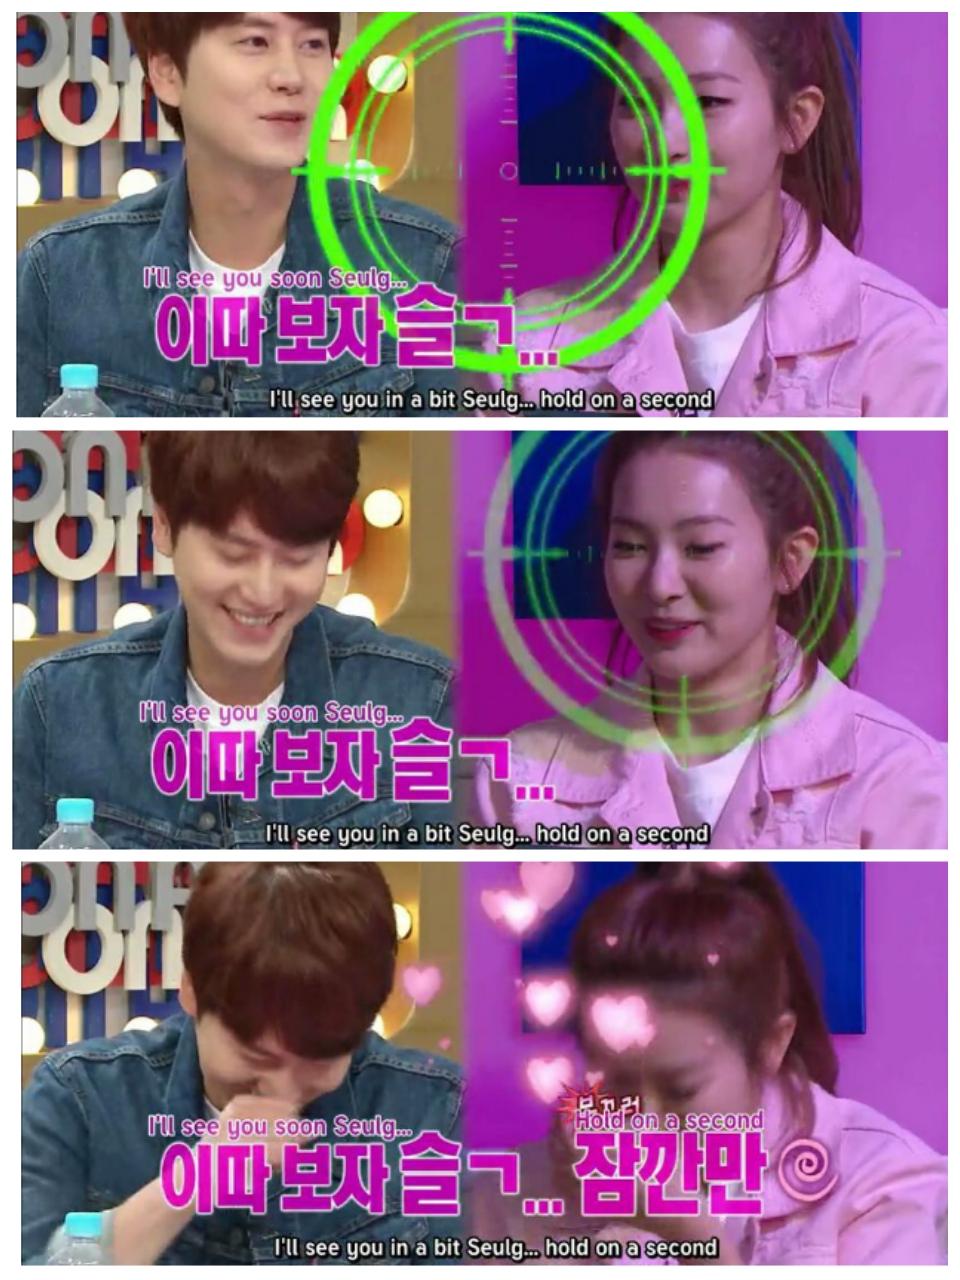 Synopsis drama musikal kyuhyun dan seohyun dating